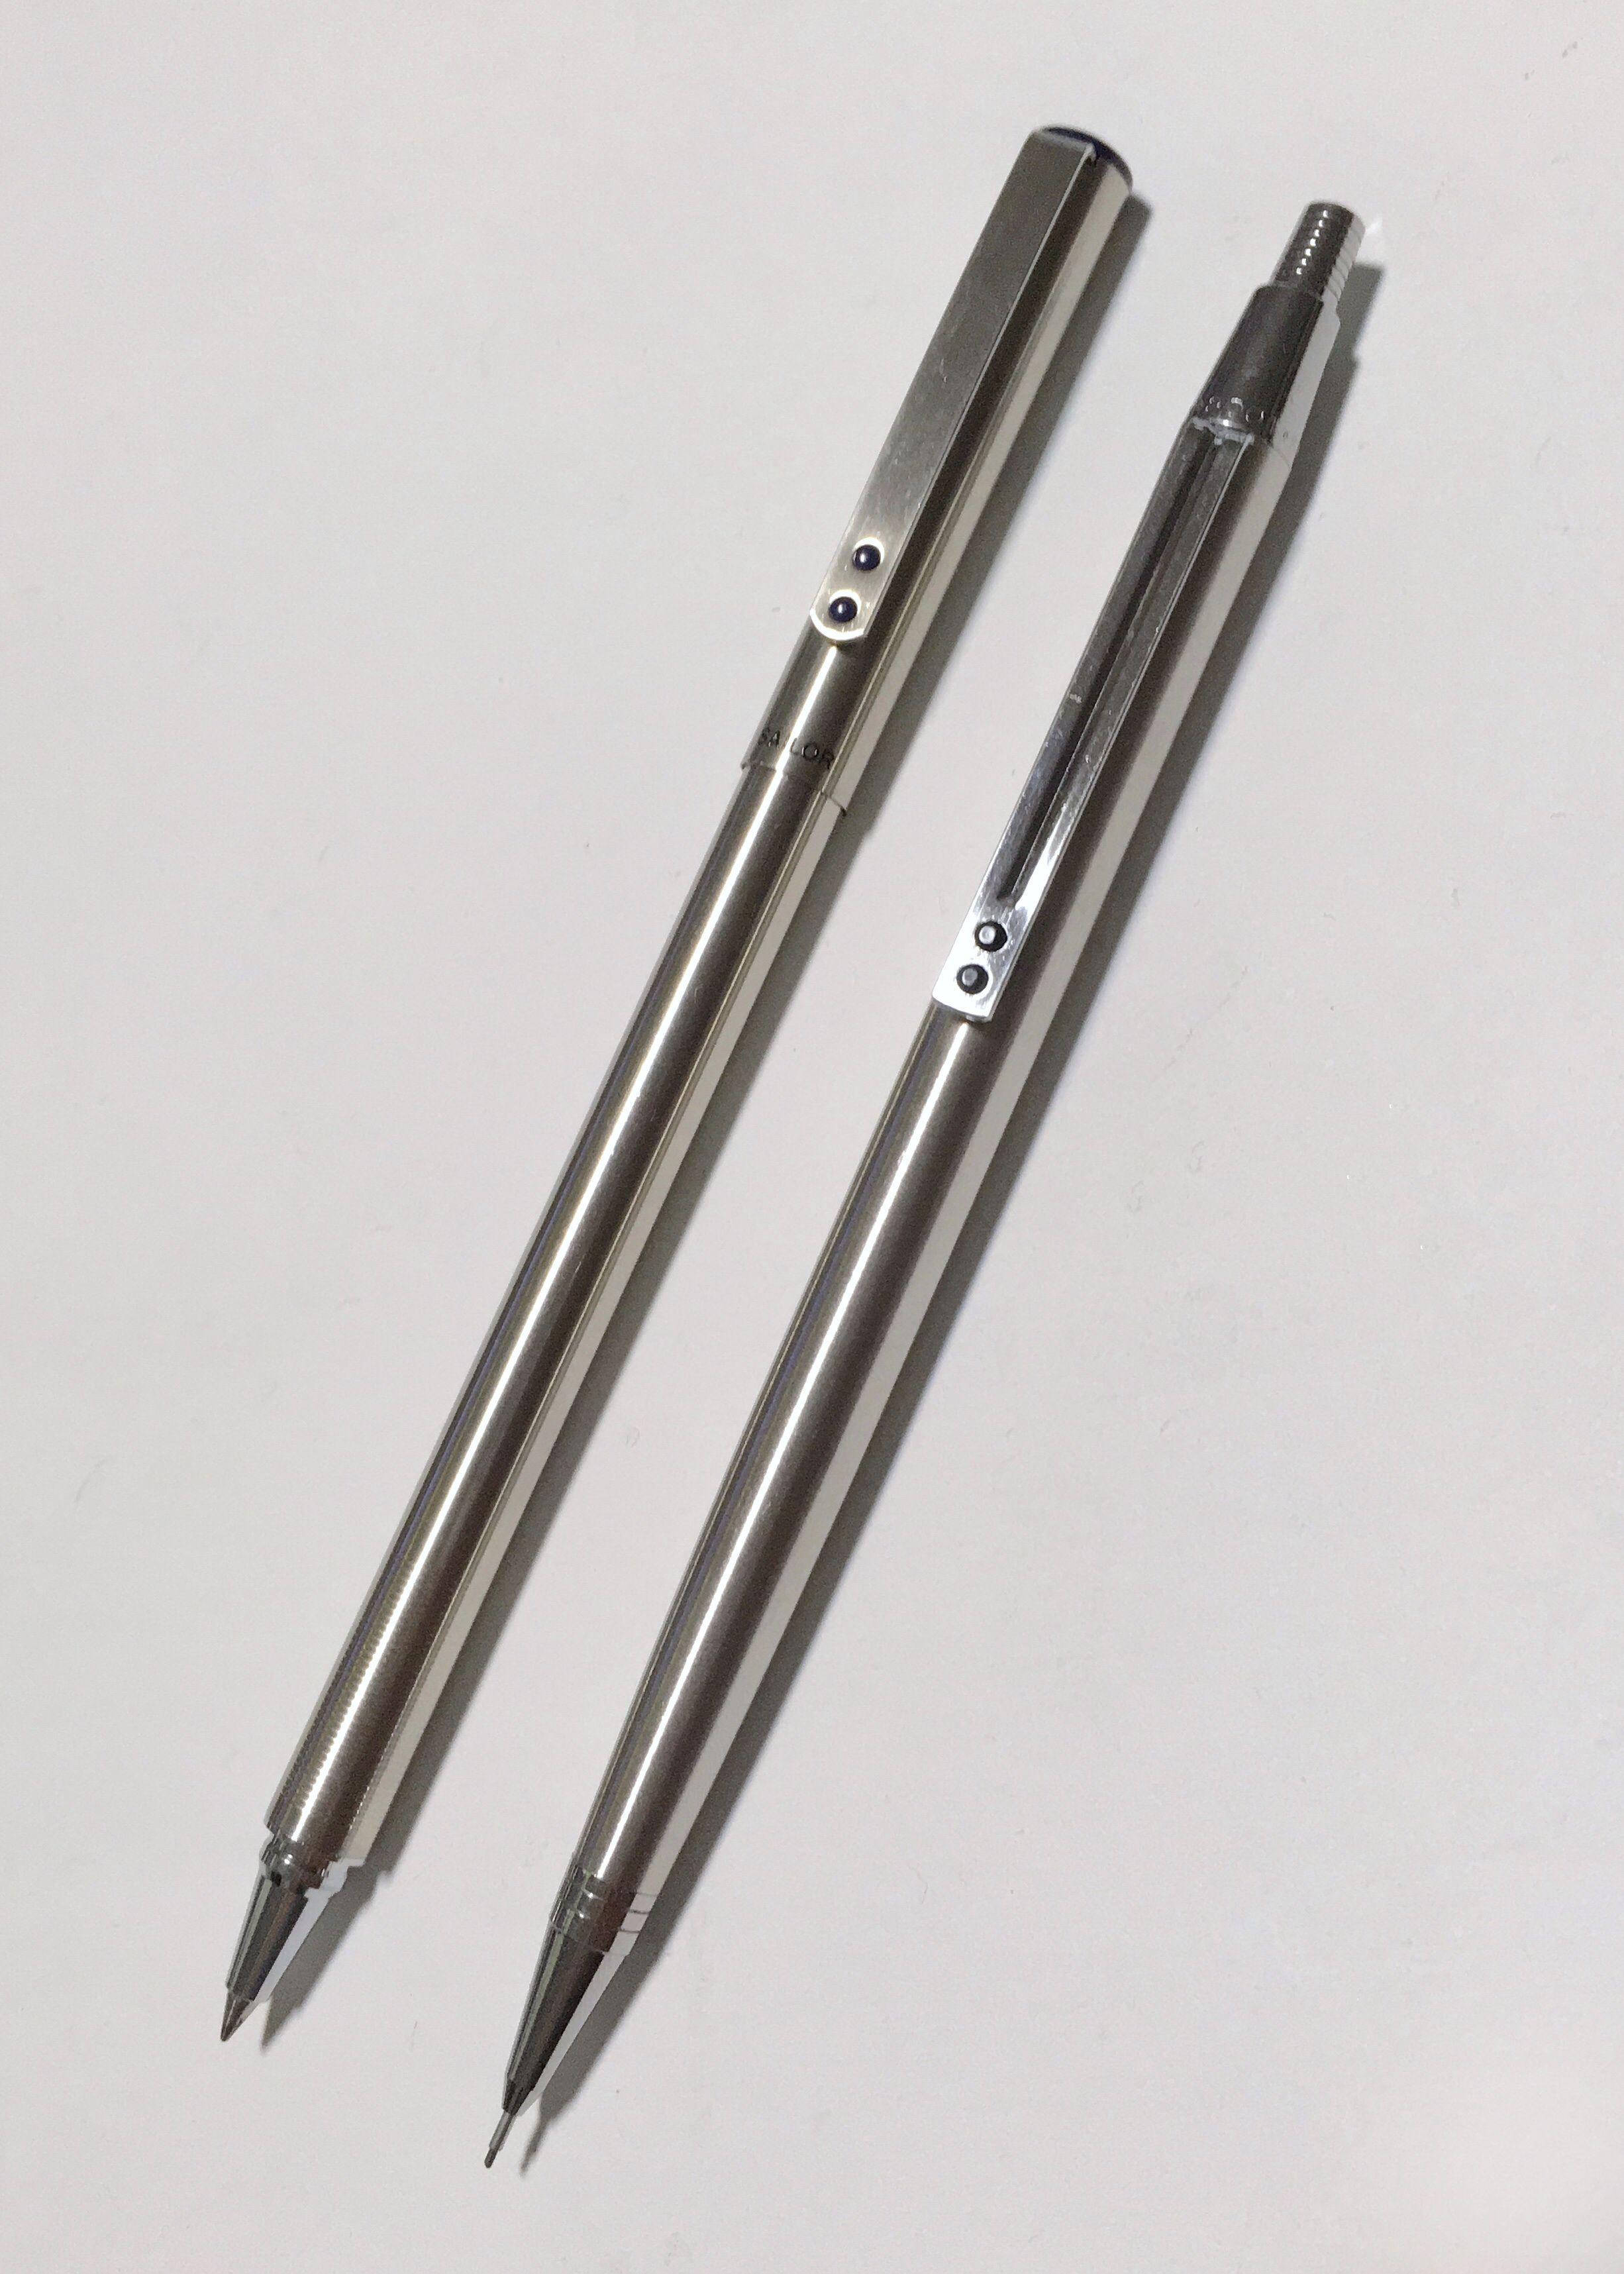 Double Dot Clips Sailor Rollerball Pen Inoxcrom 2000 Mechanical Faber Castell Neo Slim Ballpoint Stylus Stainless Steel Matt Pencil 05mm